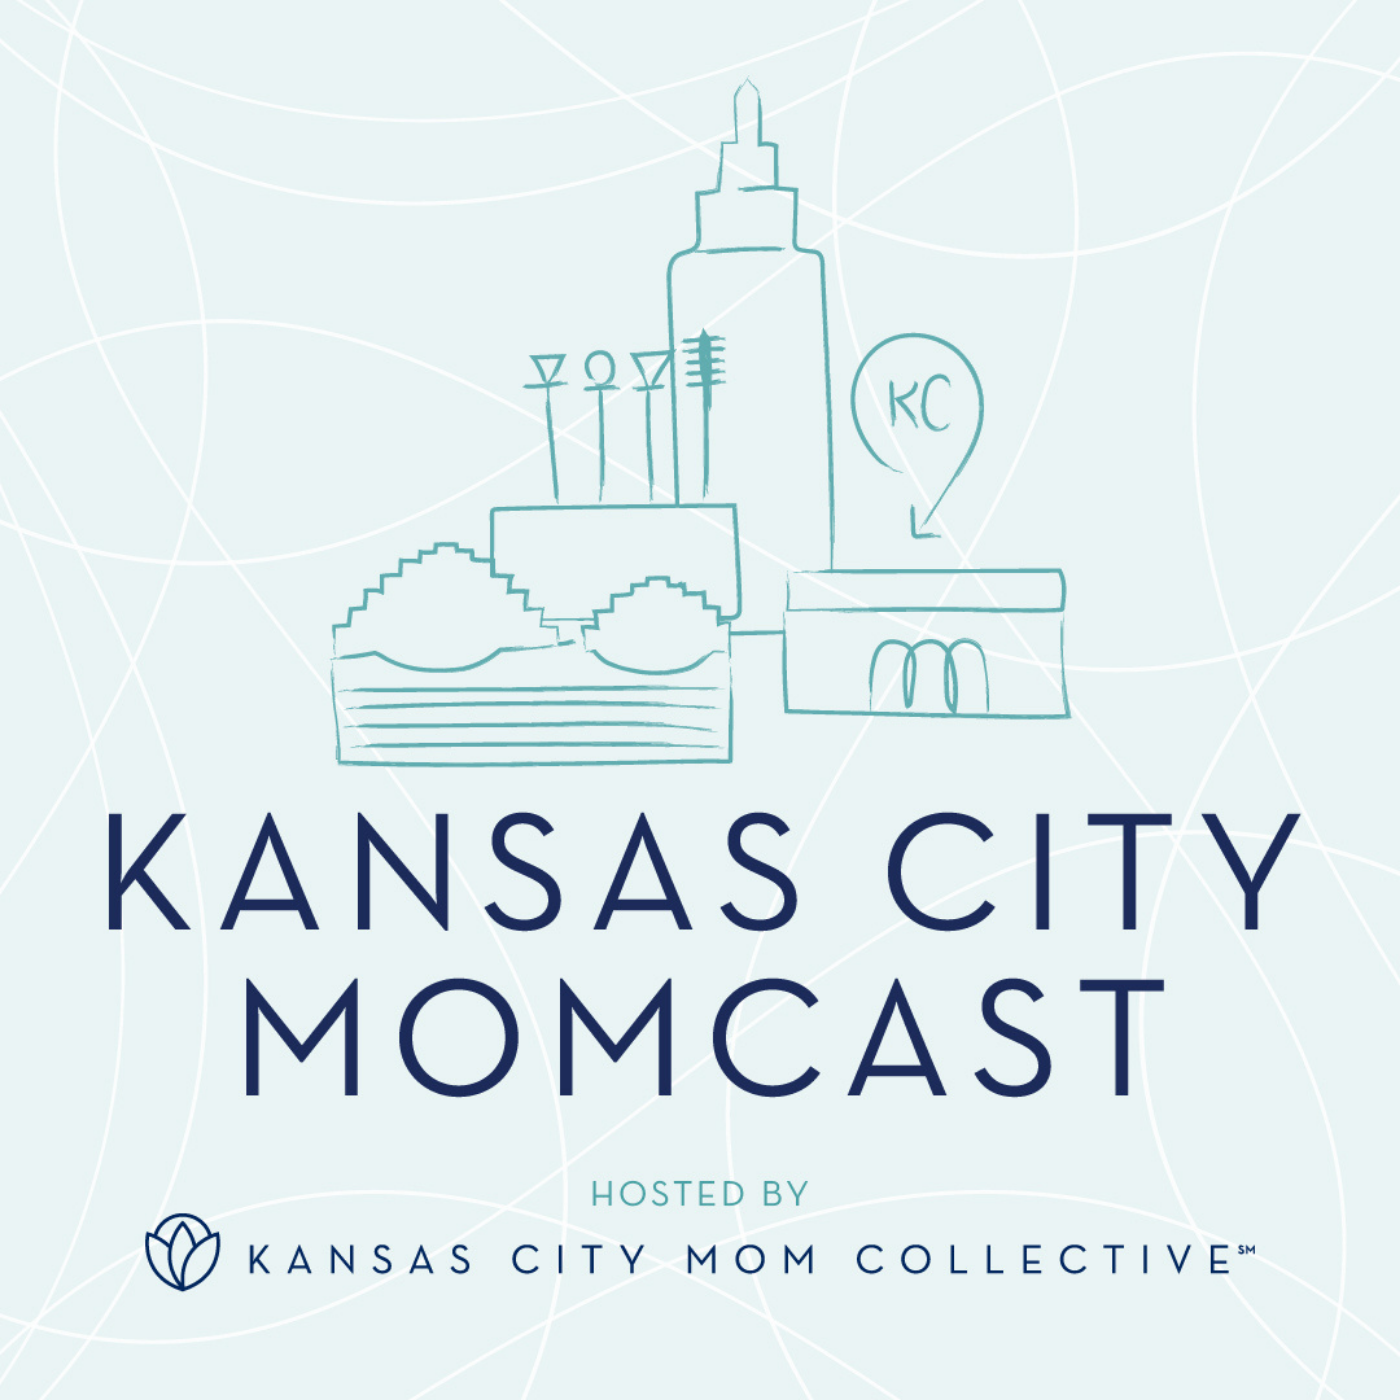 Kansas City MomCast